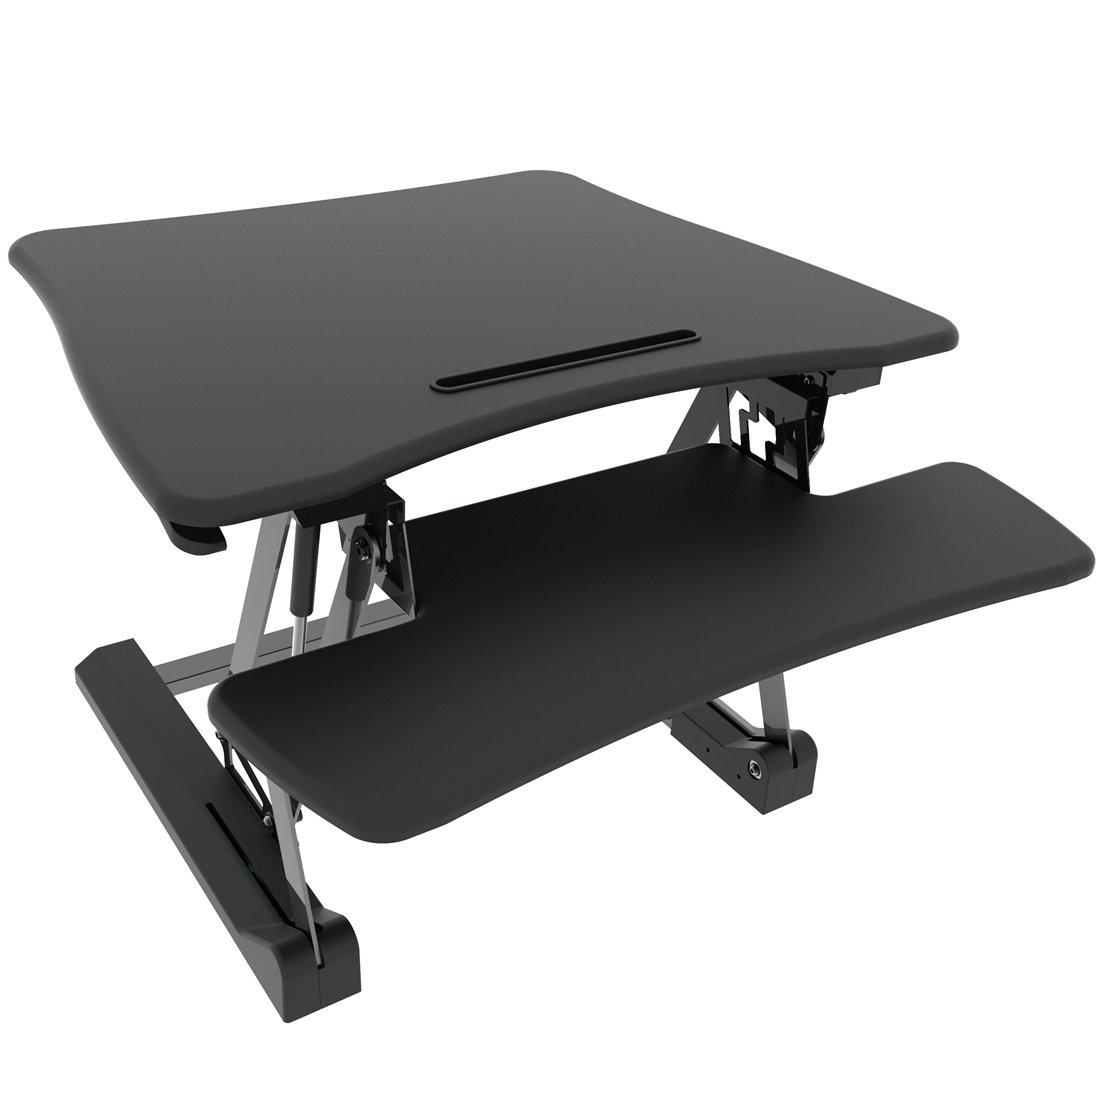 Good Life Height Adjustable Standing Desk 29'' Wide Vertical Converter Riser Stand up Sit Stand Desk Monitor Stand Computer Table Black ELC390